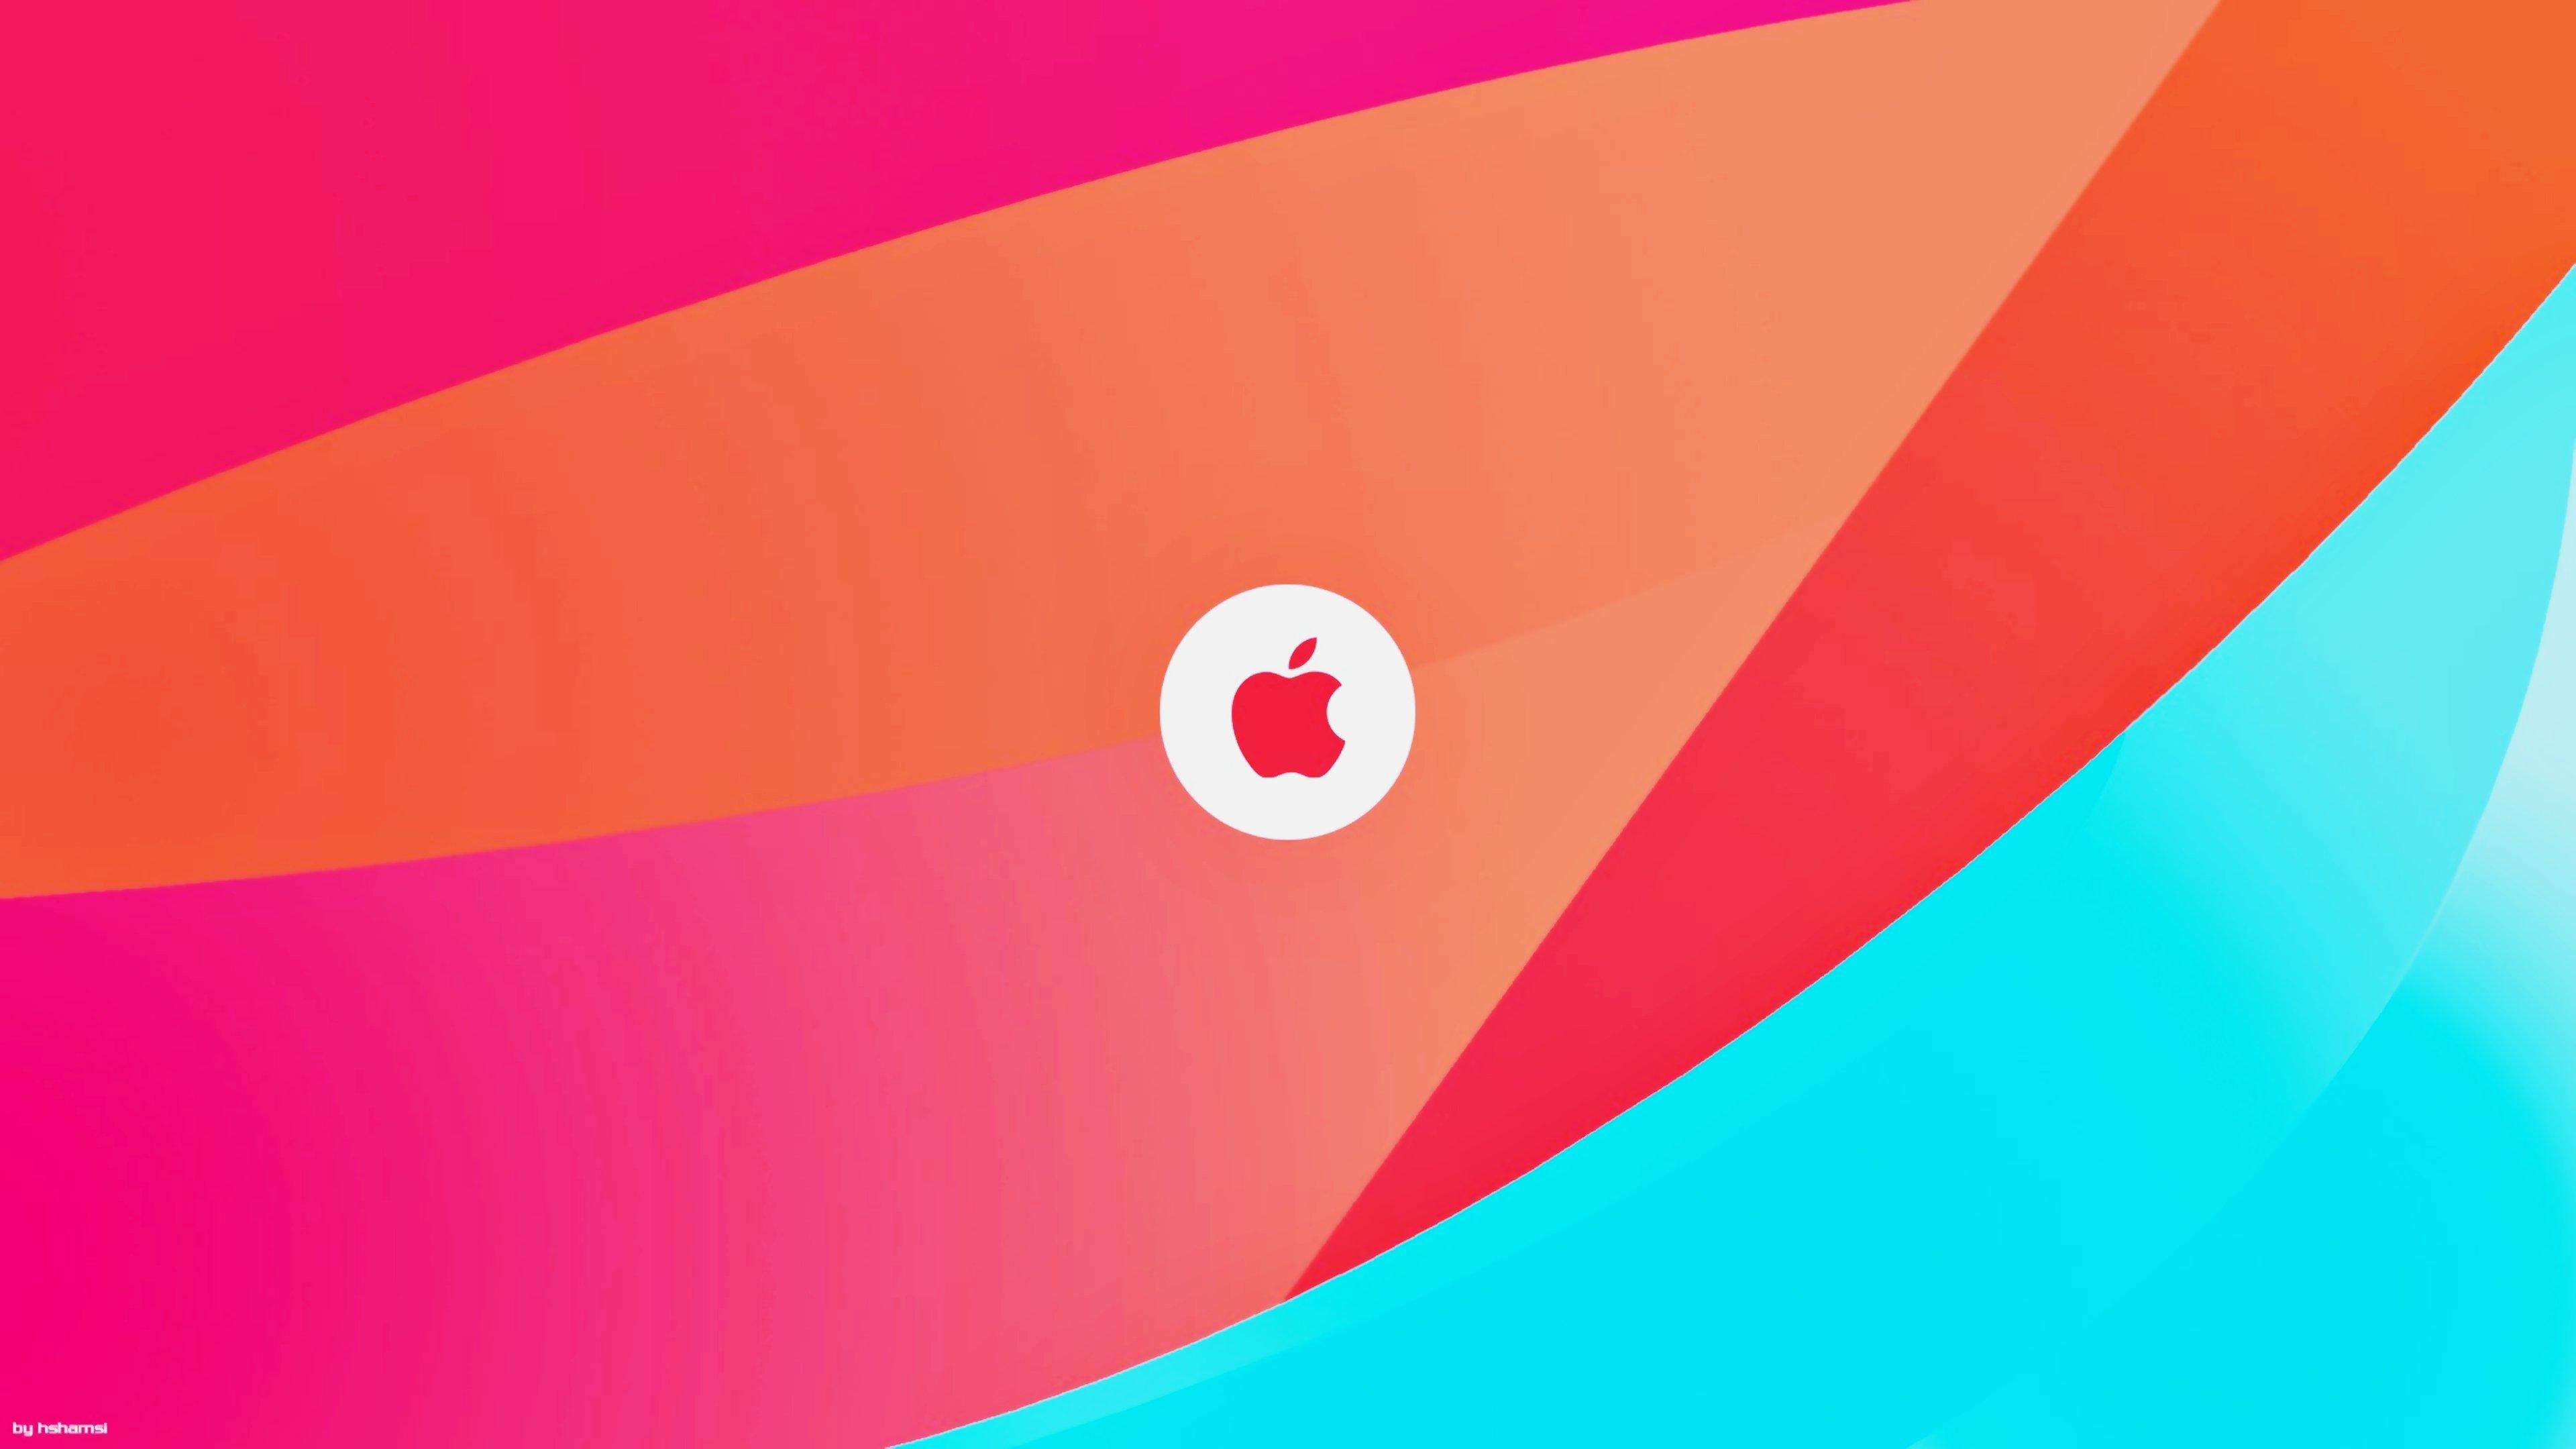 Apple MAC Colors Wallpapers HD Wallpapers